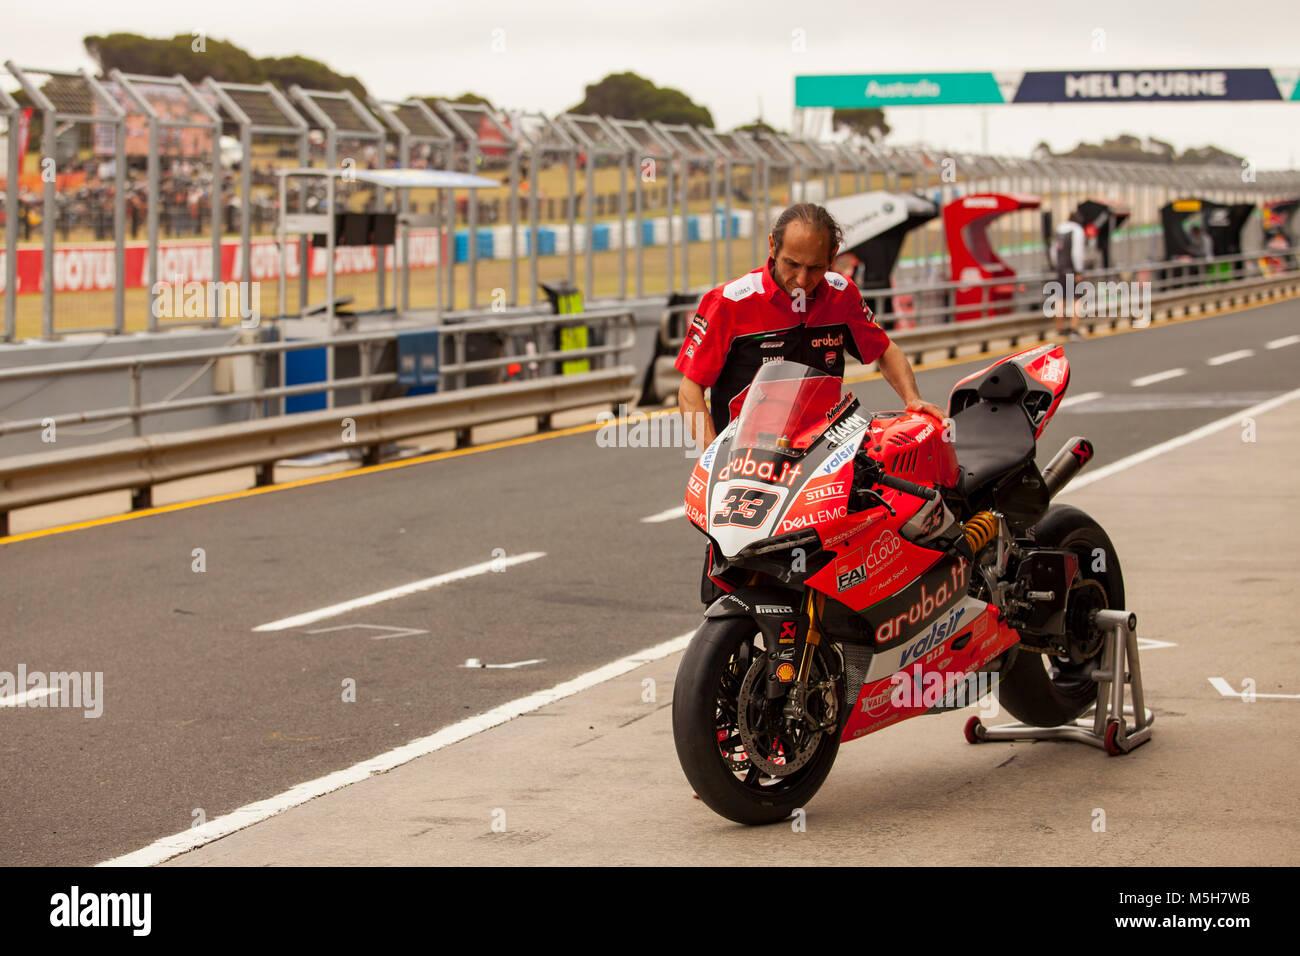 Saturday, 24 February, 2018. FIM Superbike World Championship. Phillip Island, Australia. Marco Melandri's Ducati Stock Photo